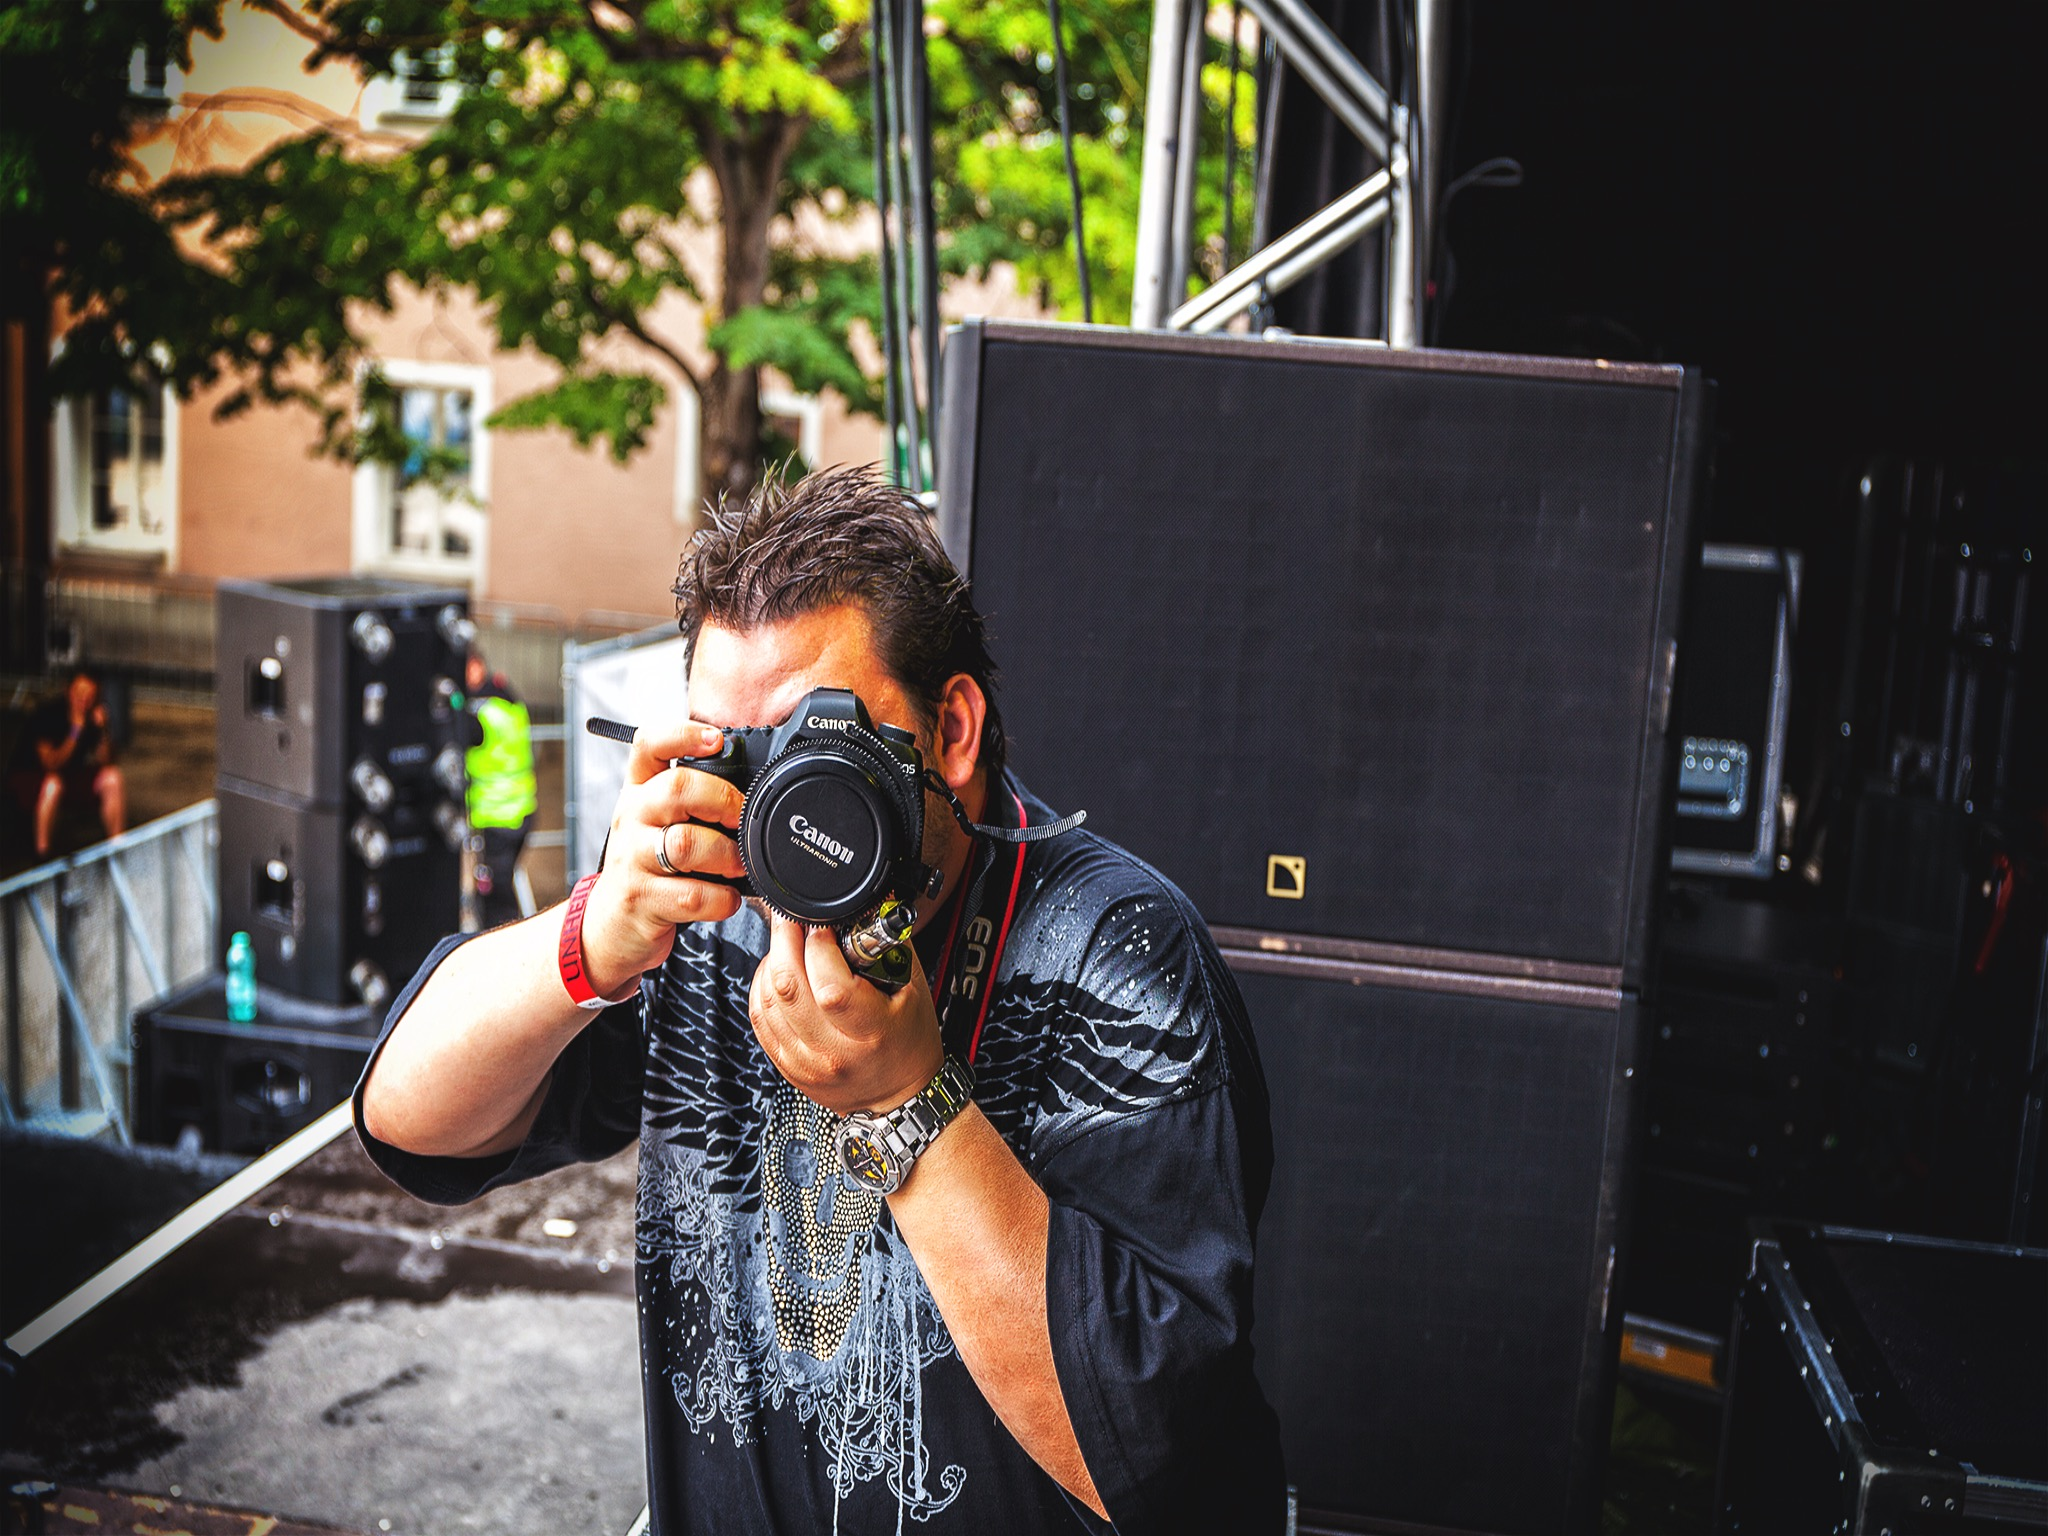 Fotograf Hendrik in Action. Foto: Hendrik Holnäck